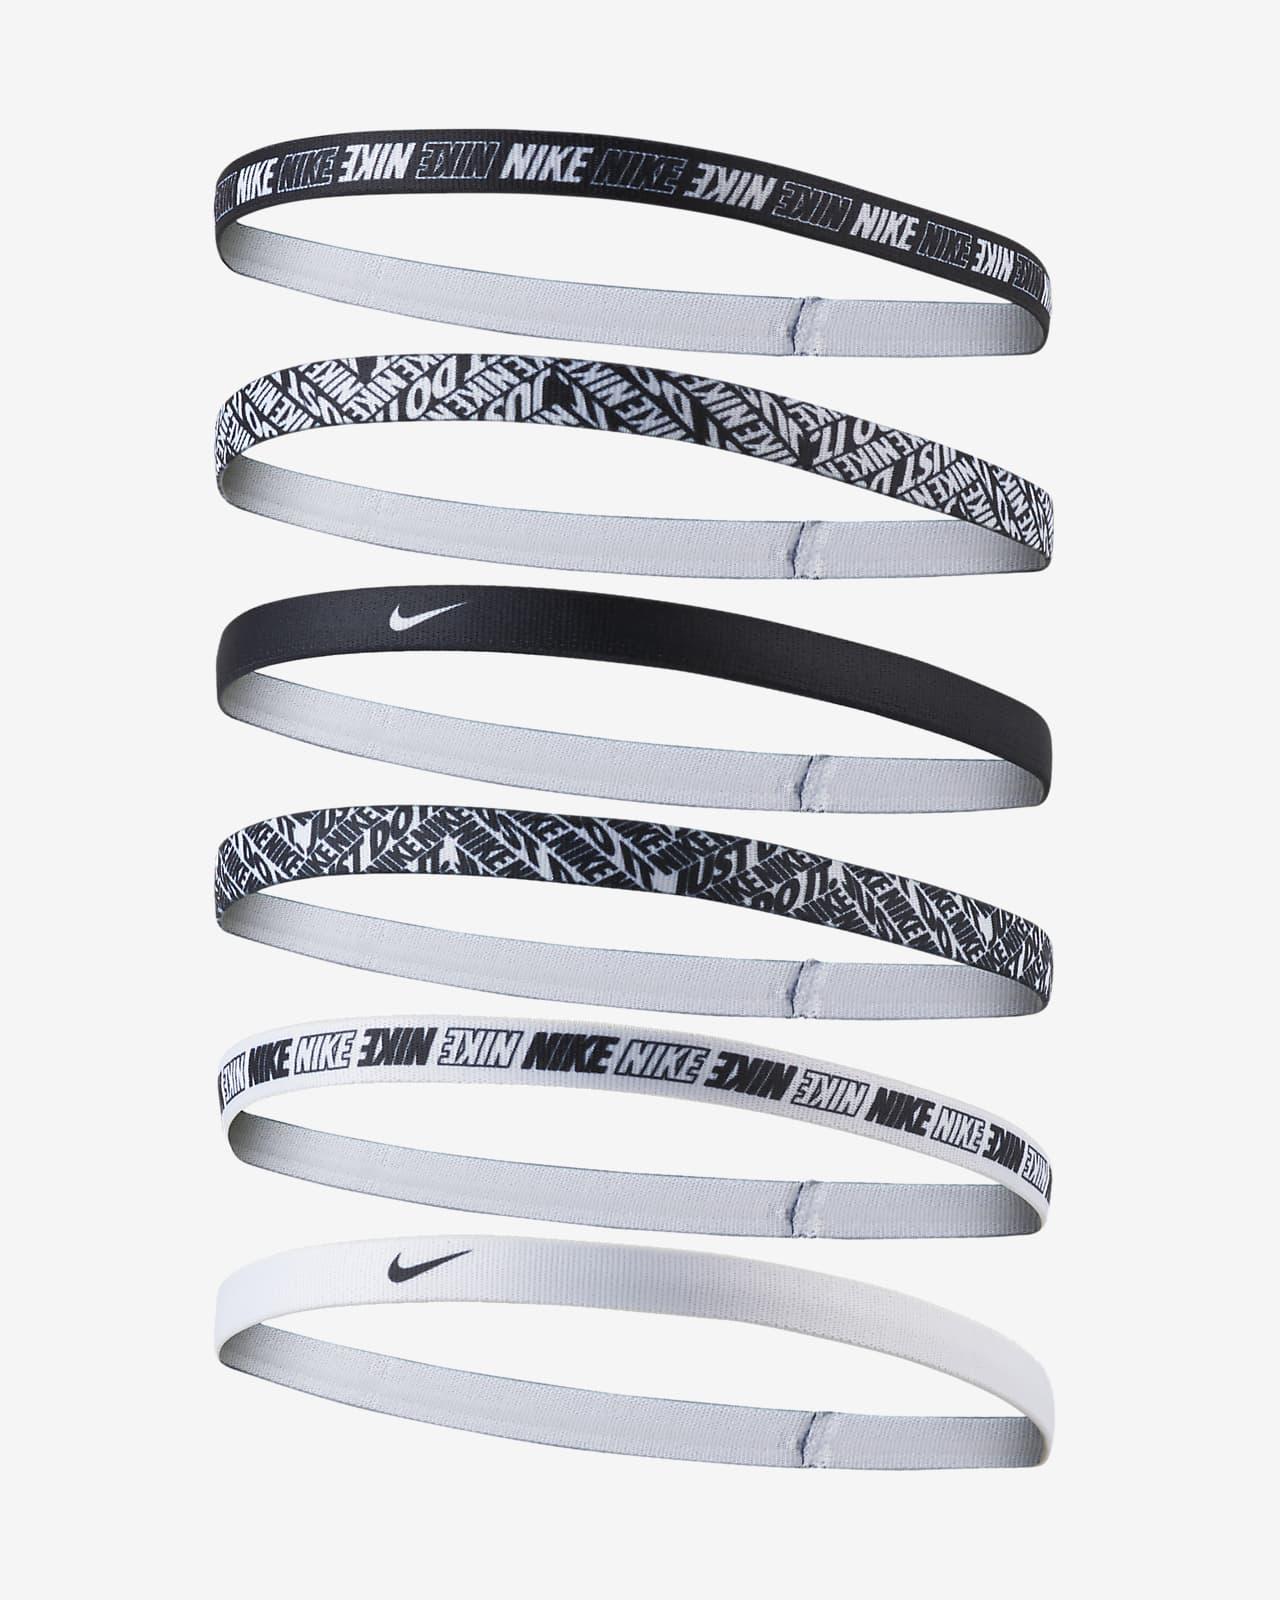 Nike Headbands (6-Pack)